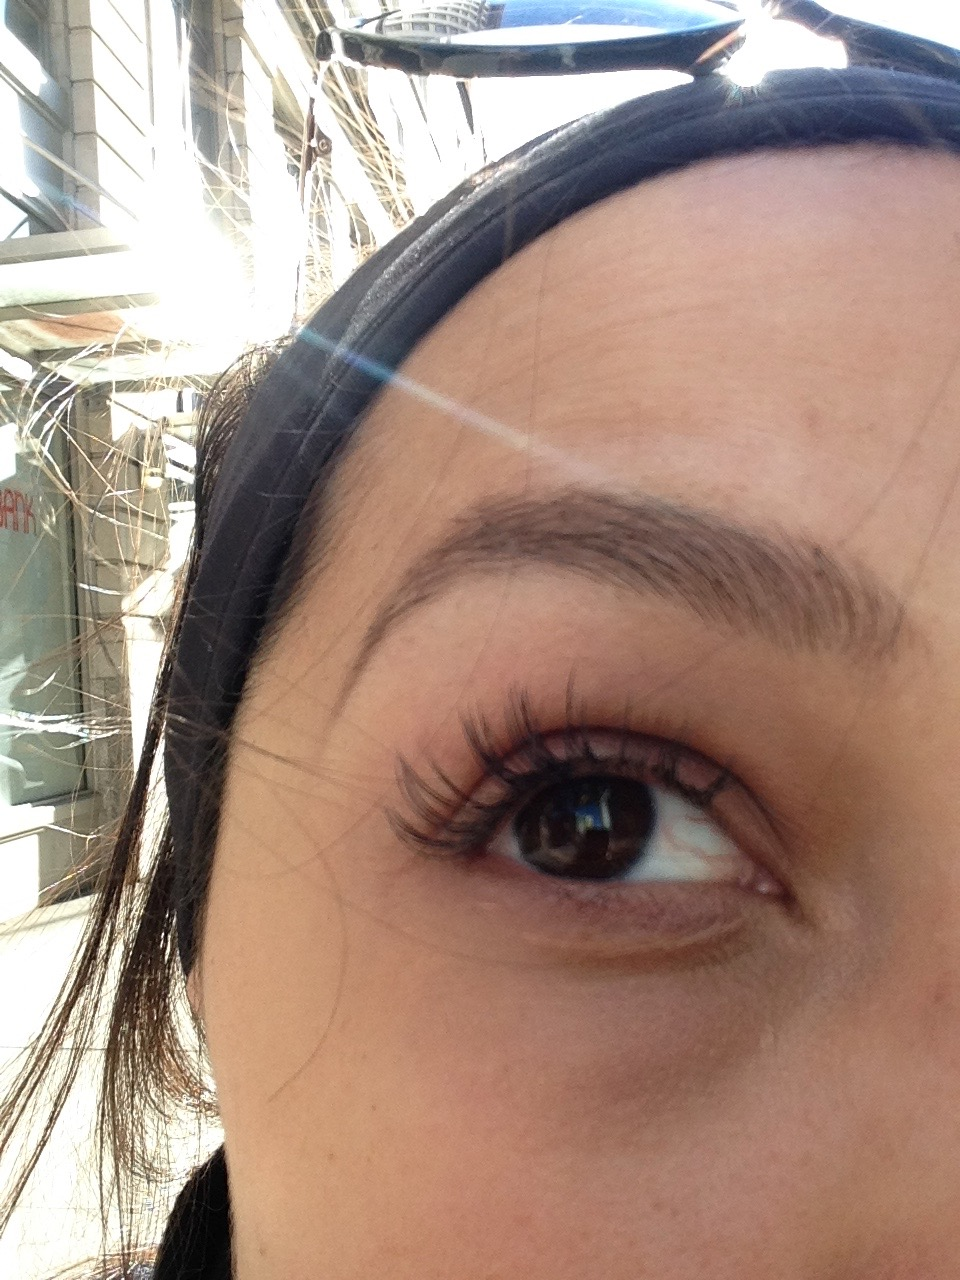 Kindly ignore the fading eyelash extensions & dark under-eye circles, THANKS